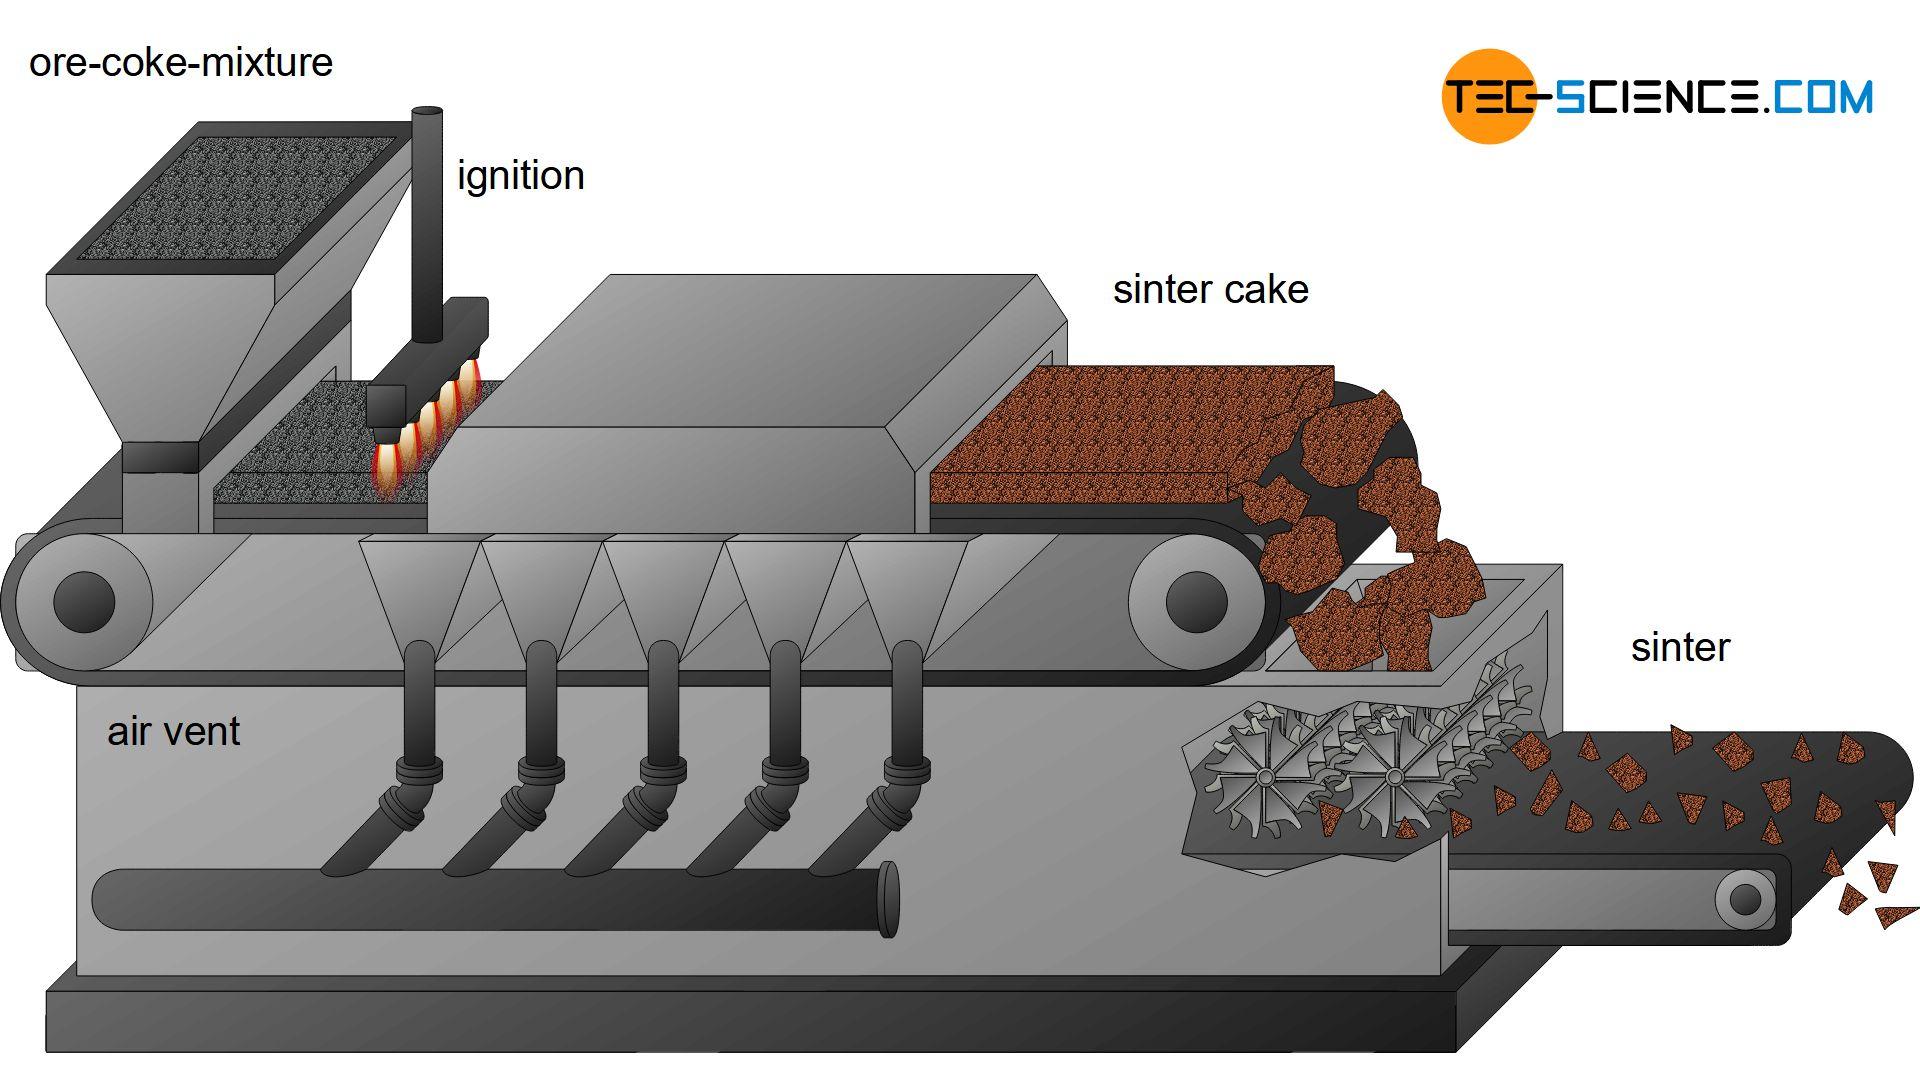 Sintering of iron ores